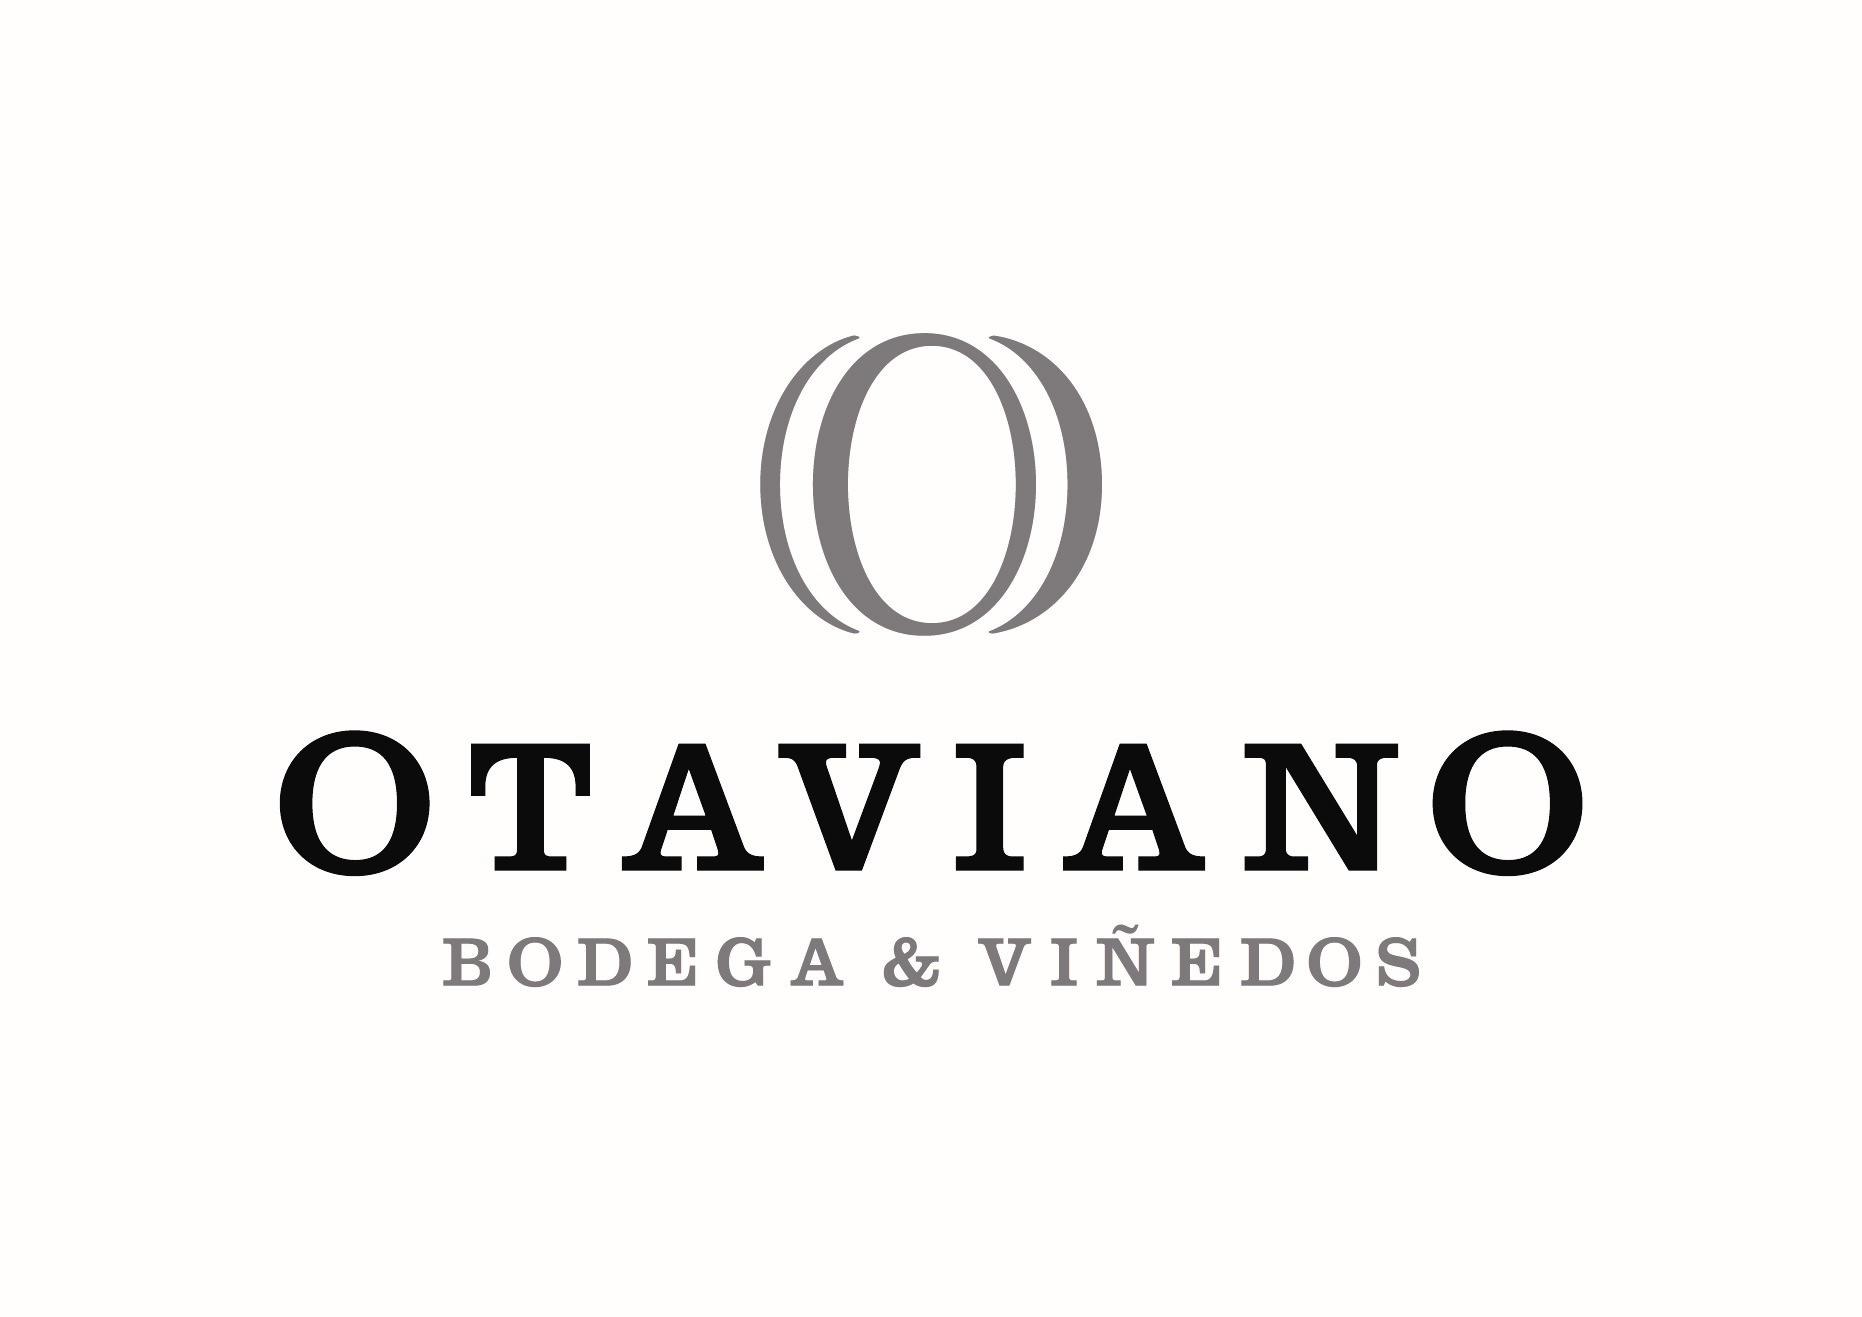 Otaviano Bodega & Viñedos